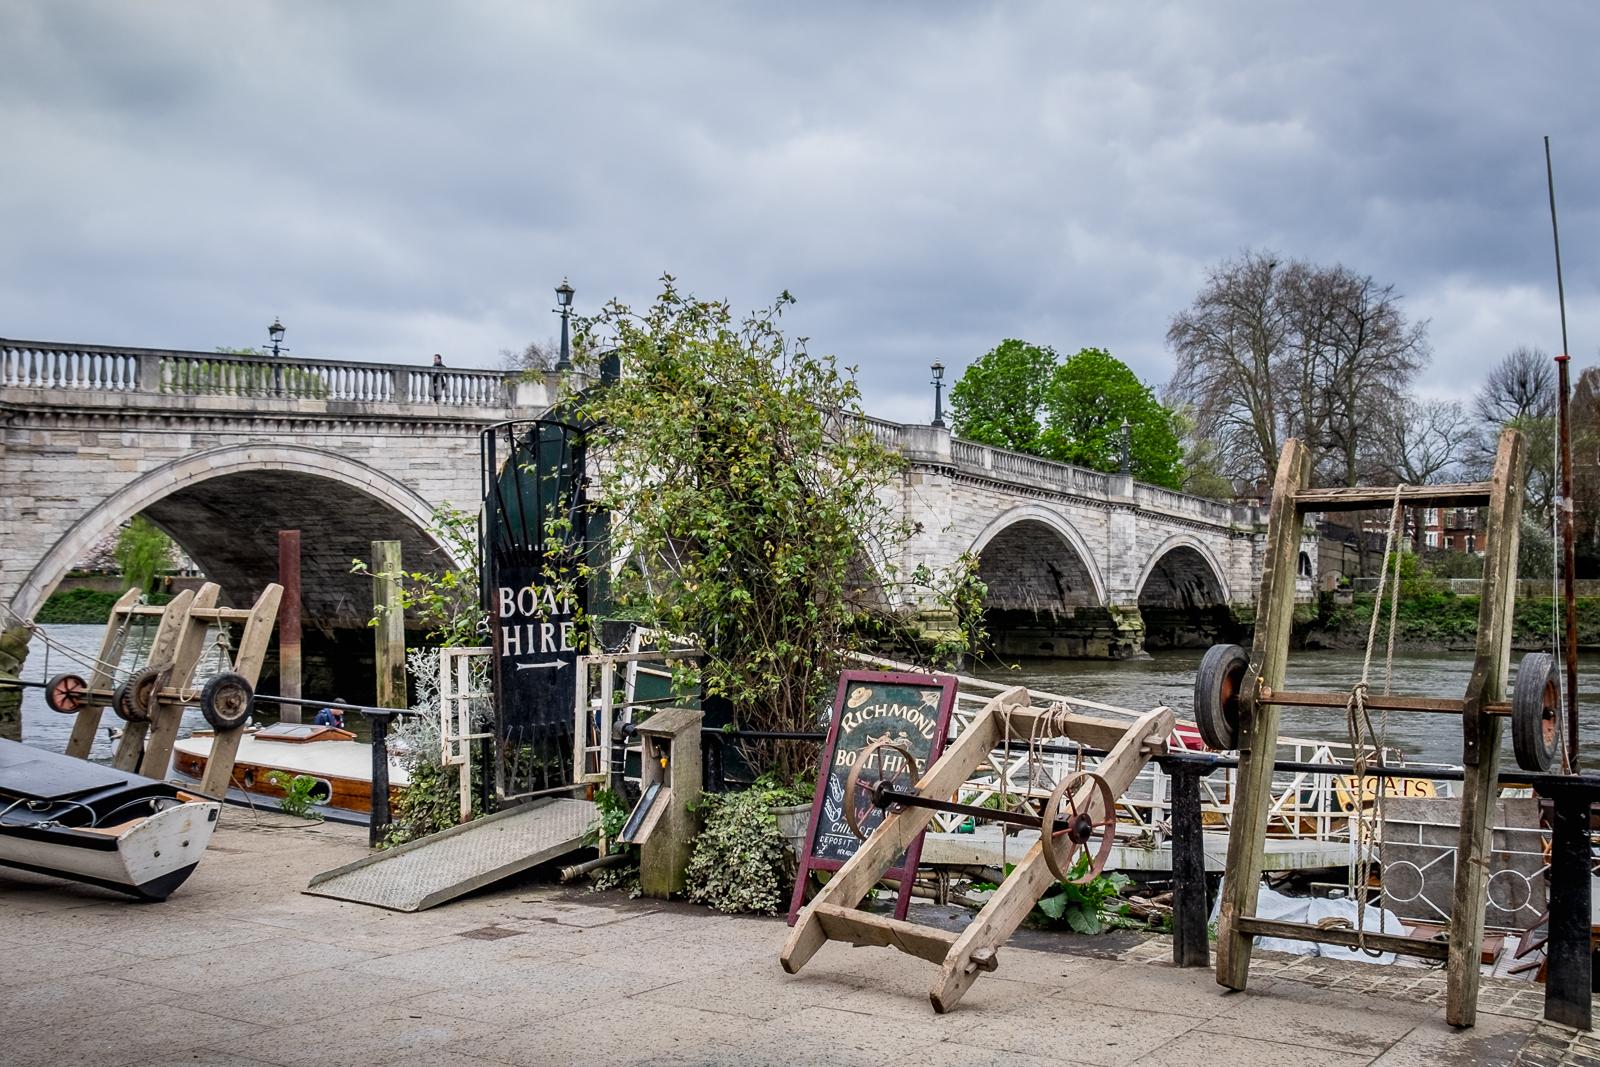 20160416_Richmond-Upon-Thames_Richmond-Bridge_Boats-hire